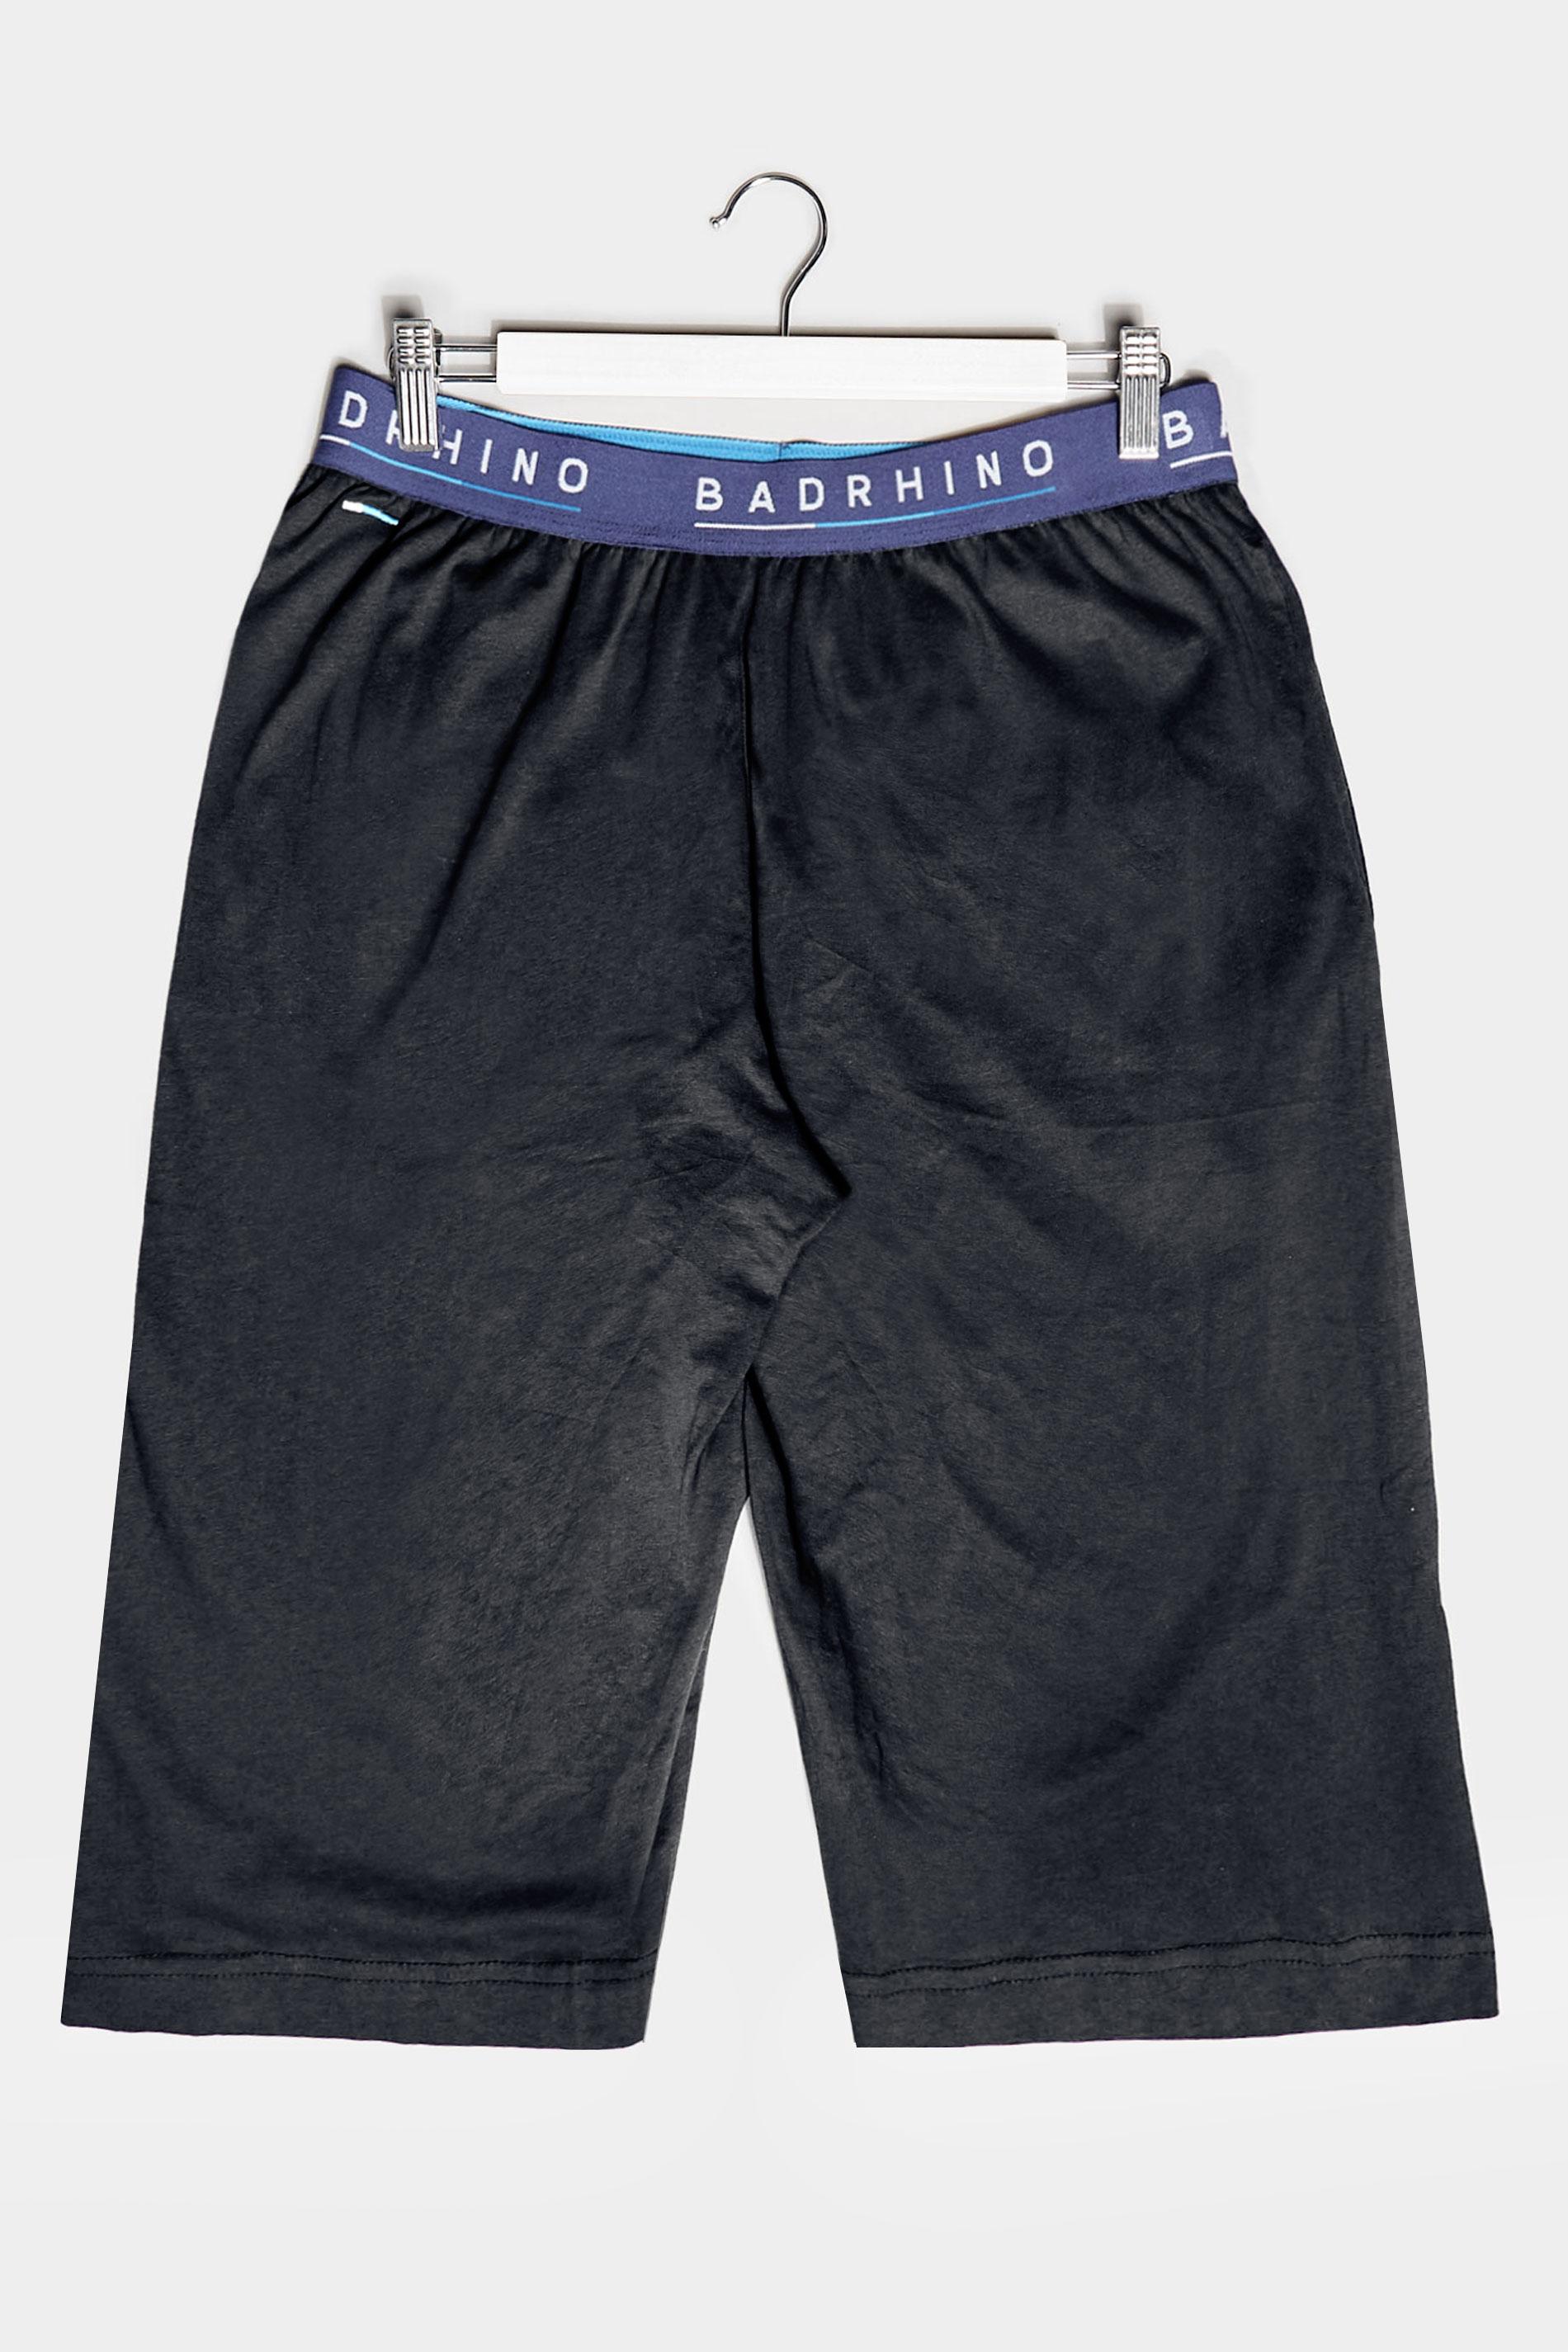 BadRhino Black Essential Lounge Shorts